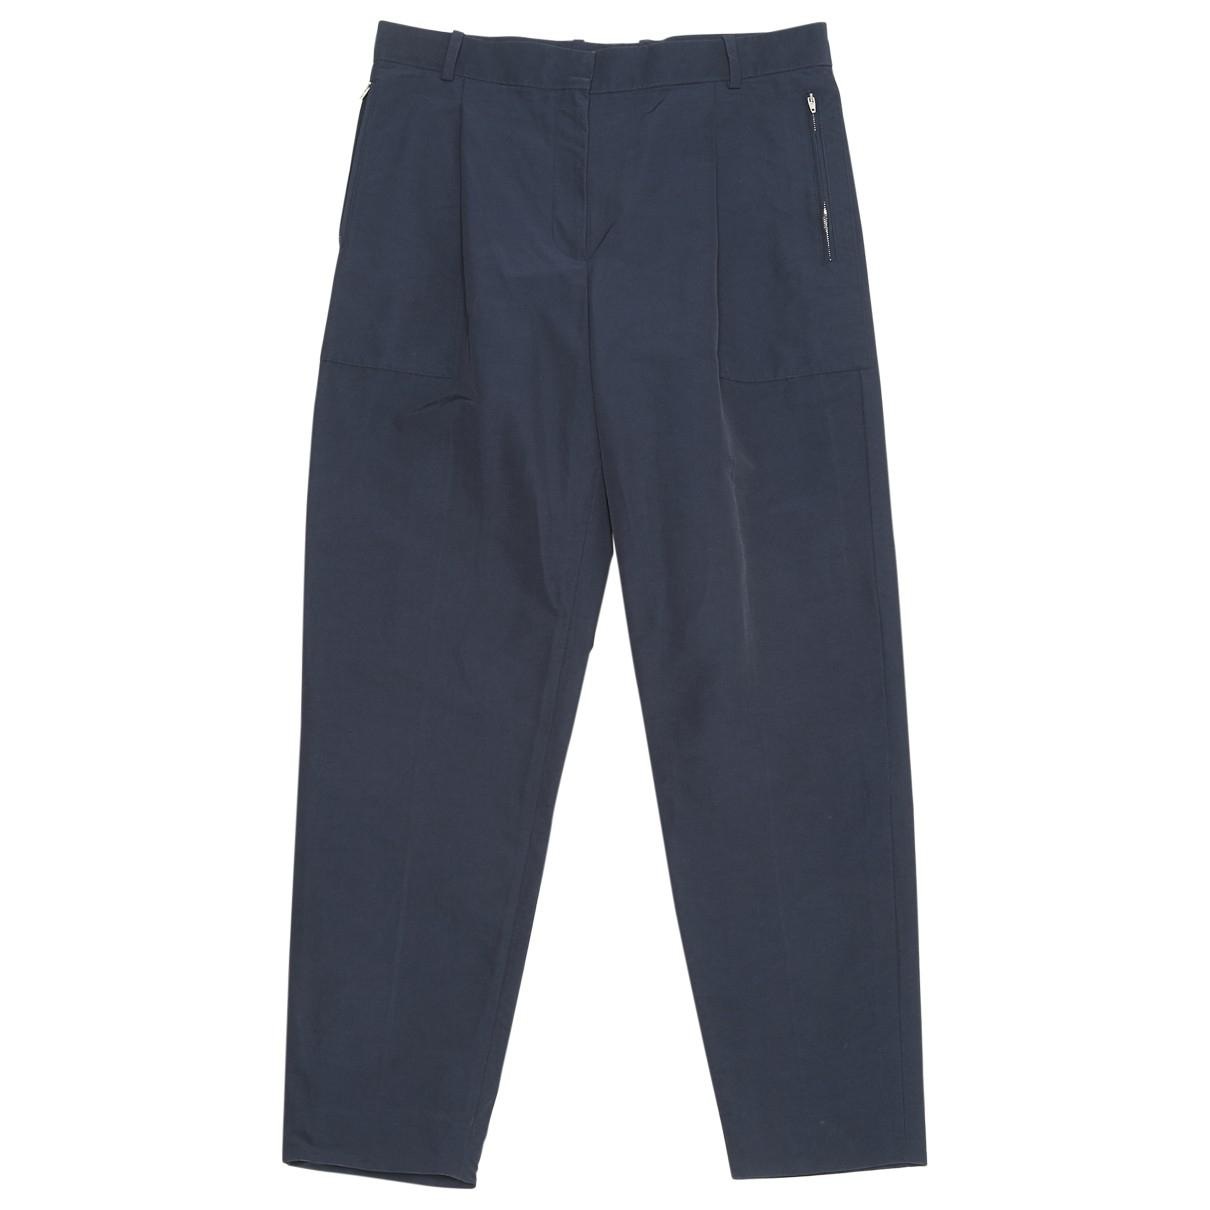 e4b53dbd449c47 Céline Carrot Pants in Blue - Lyst